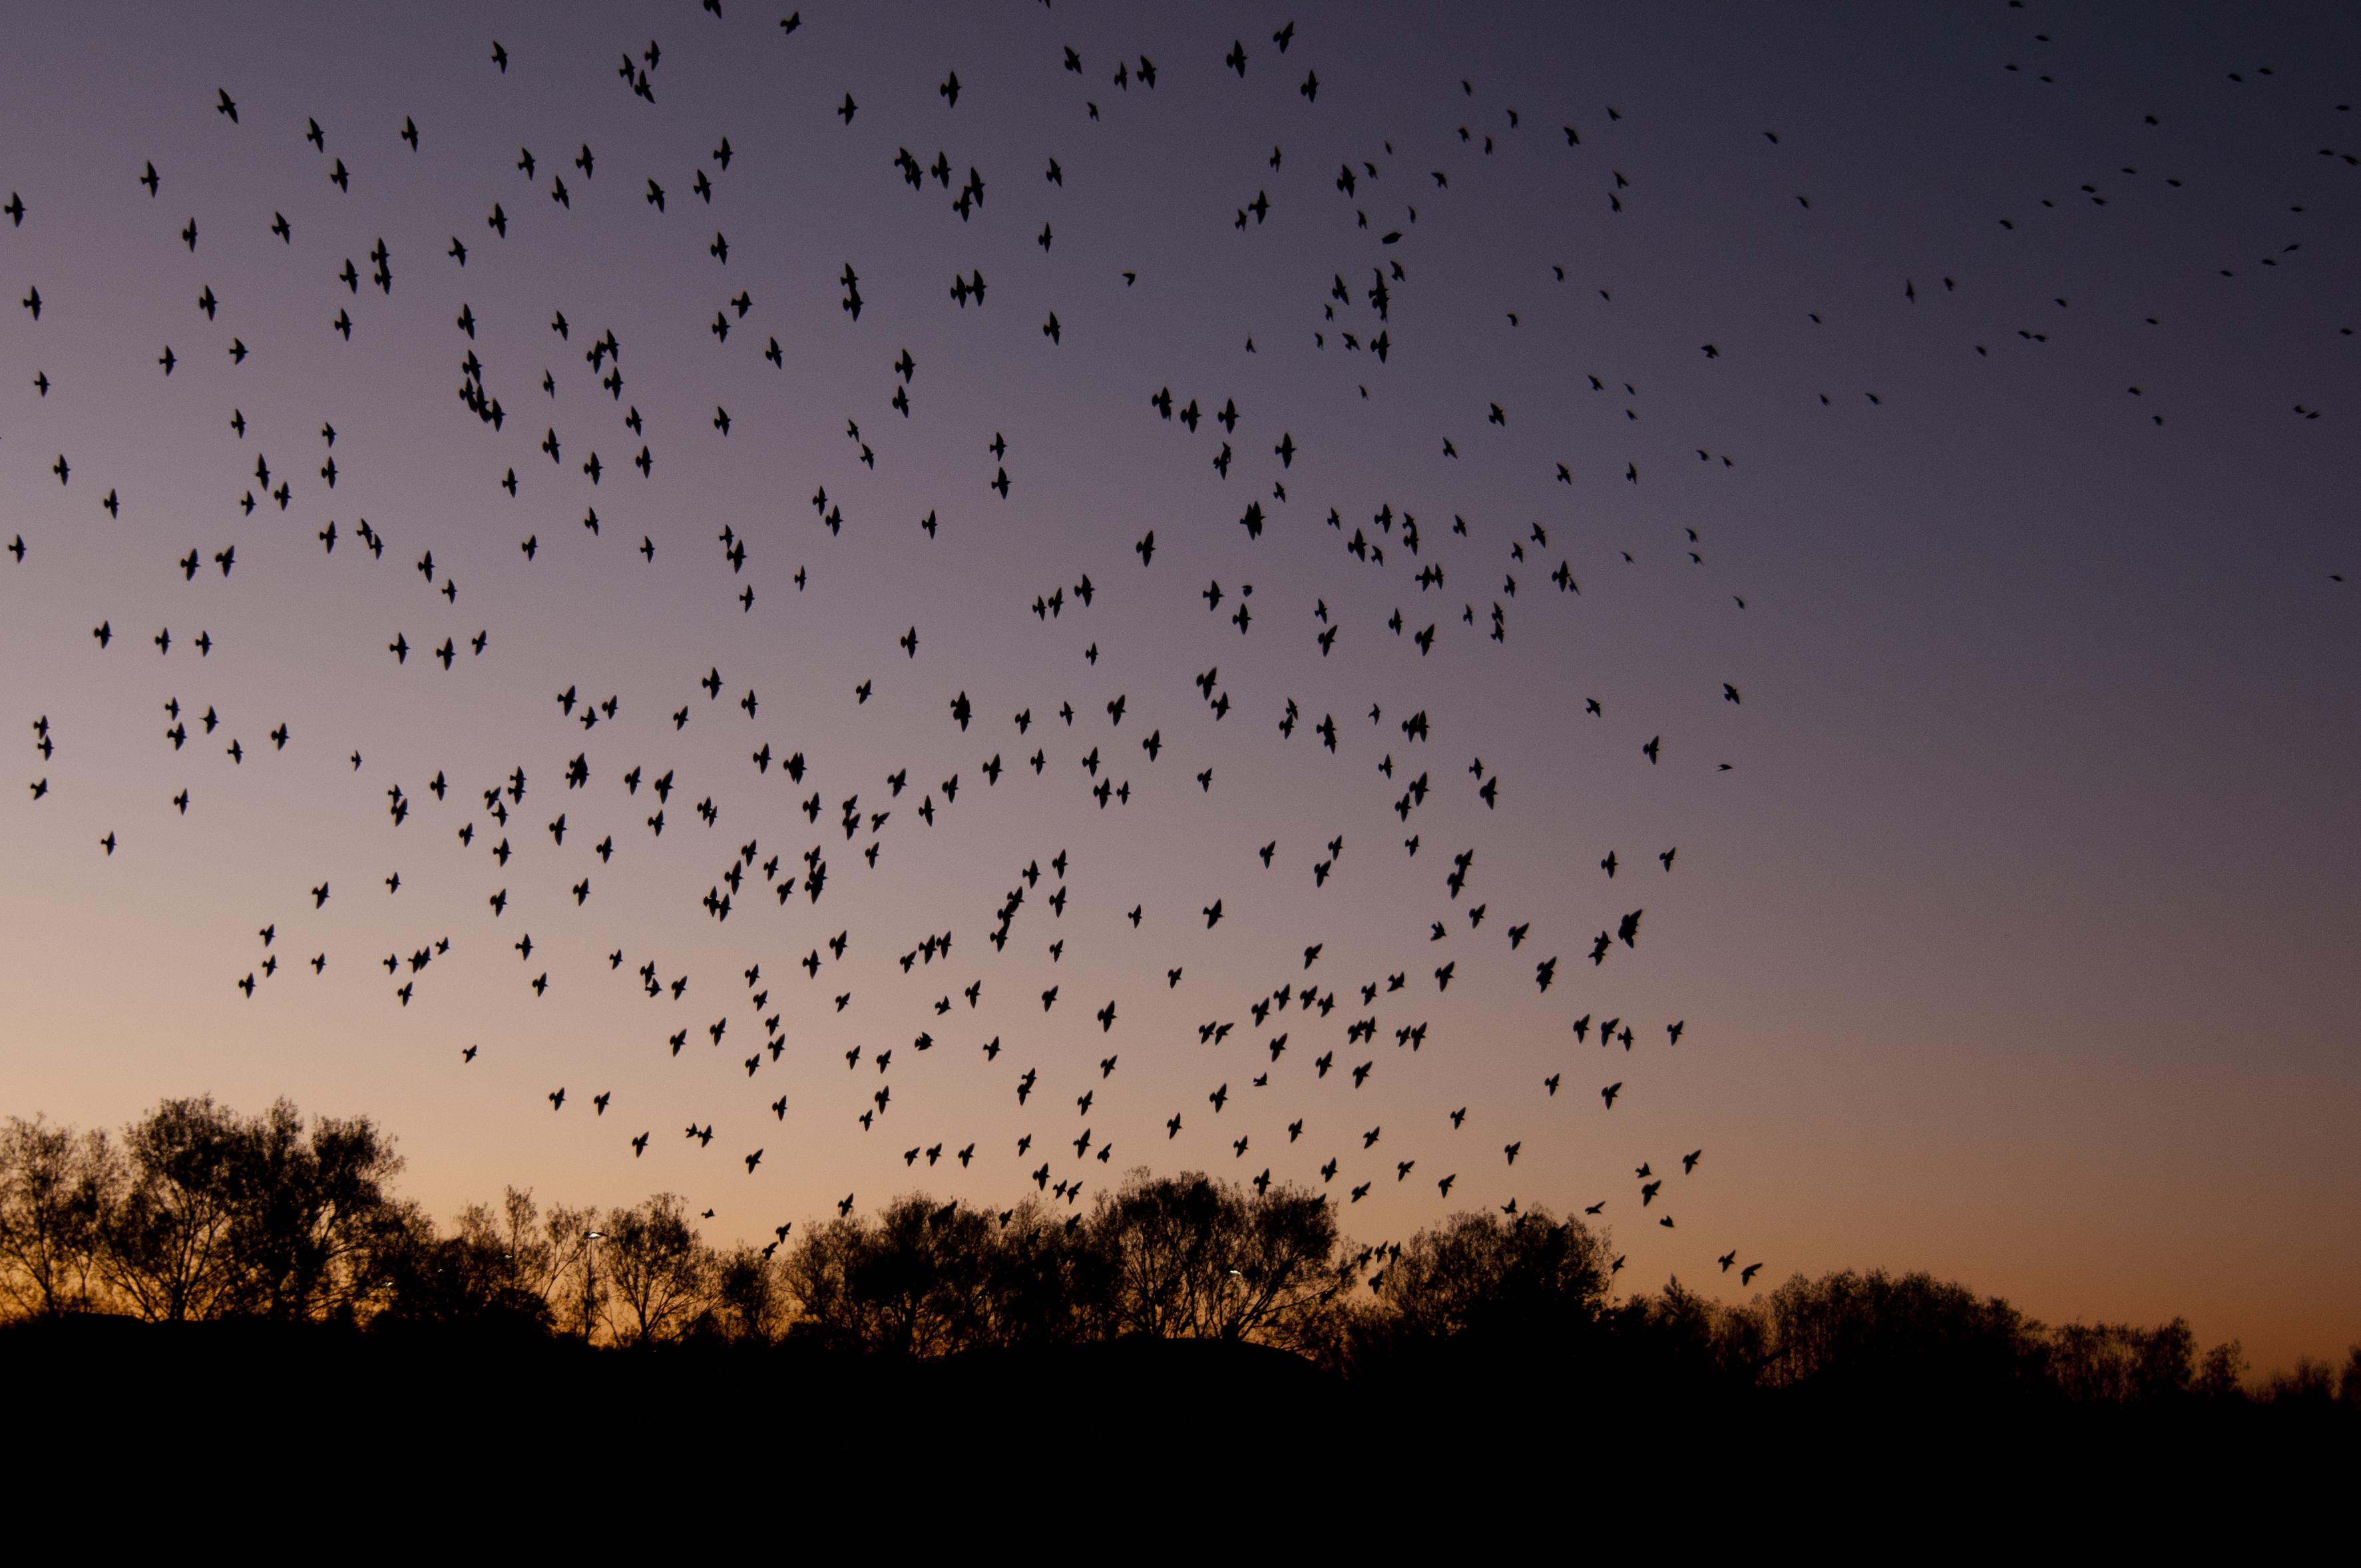 A flock of birds at dusk